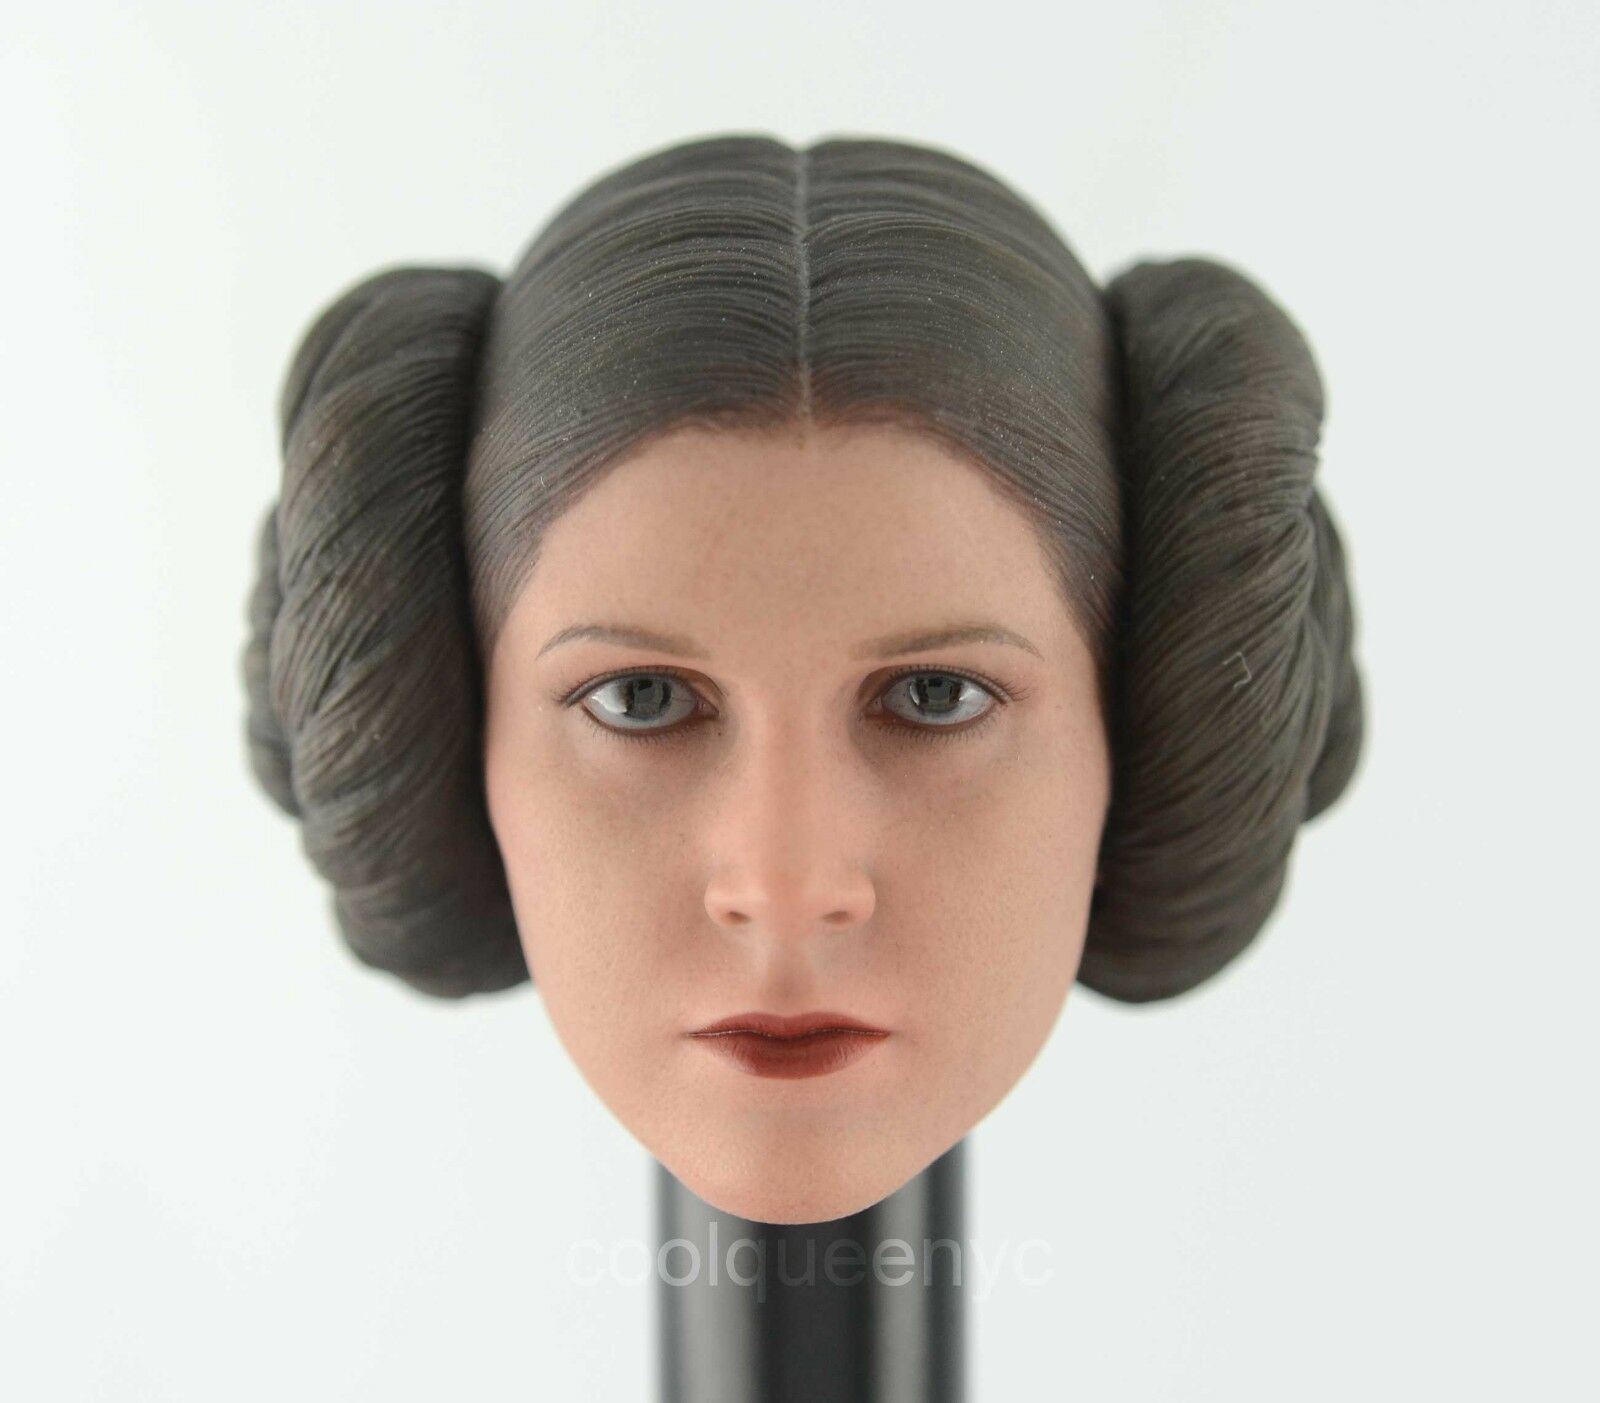 Hot Toys 1/6 Scale MMS298 Star Sculpt Wars Princess Leia Figure - Head Sculpt Star 81243c